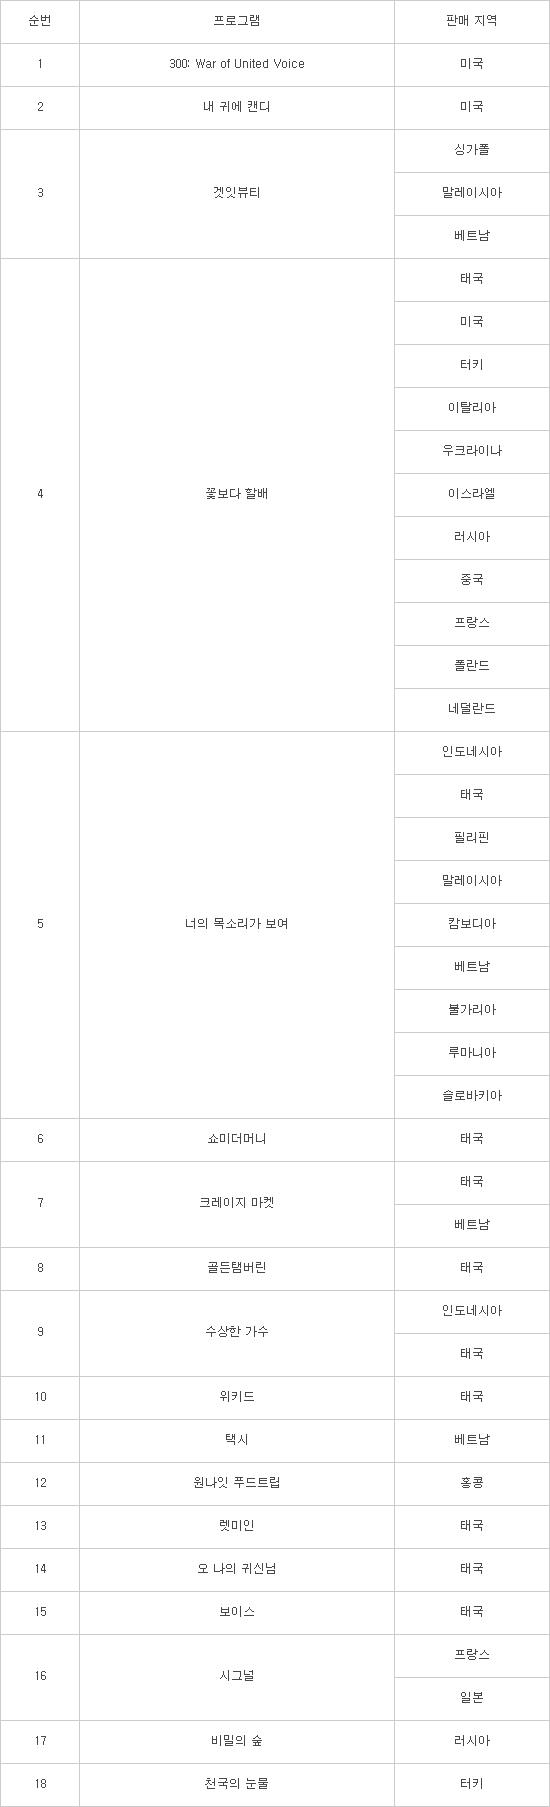 CJ ENM, tvN 떼창 예능 '300' 美 수출